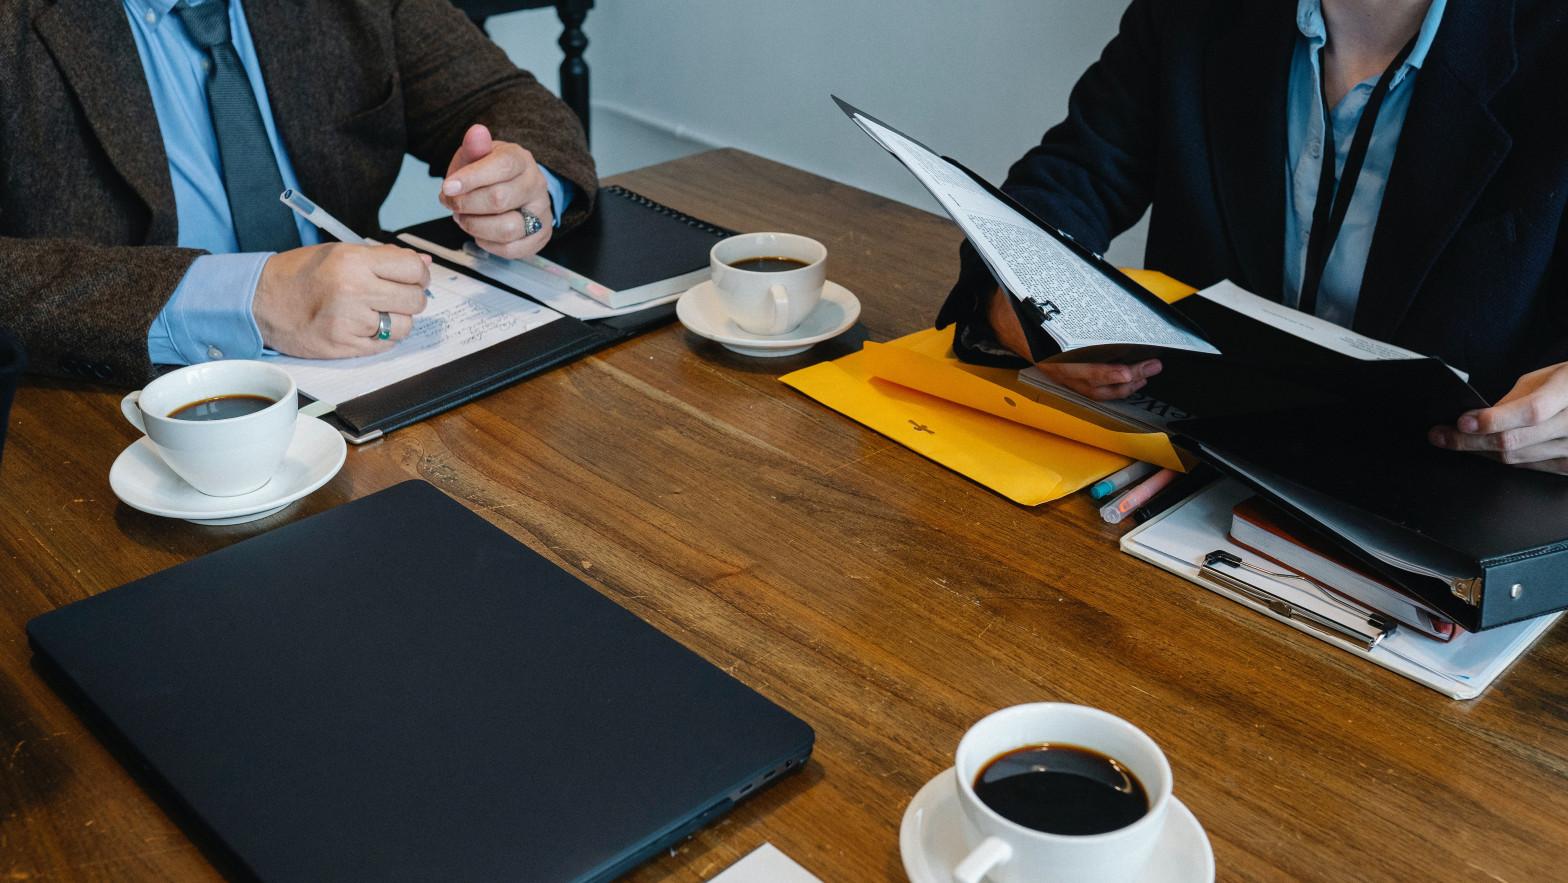 Las empresas estarán obligadas a contratar a un empleado por cada jubilación forzosa